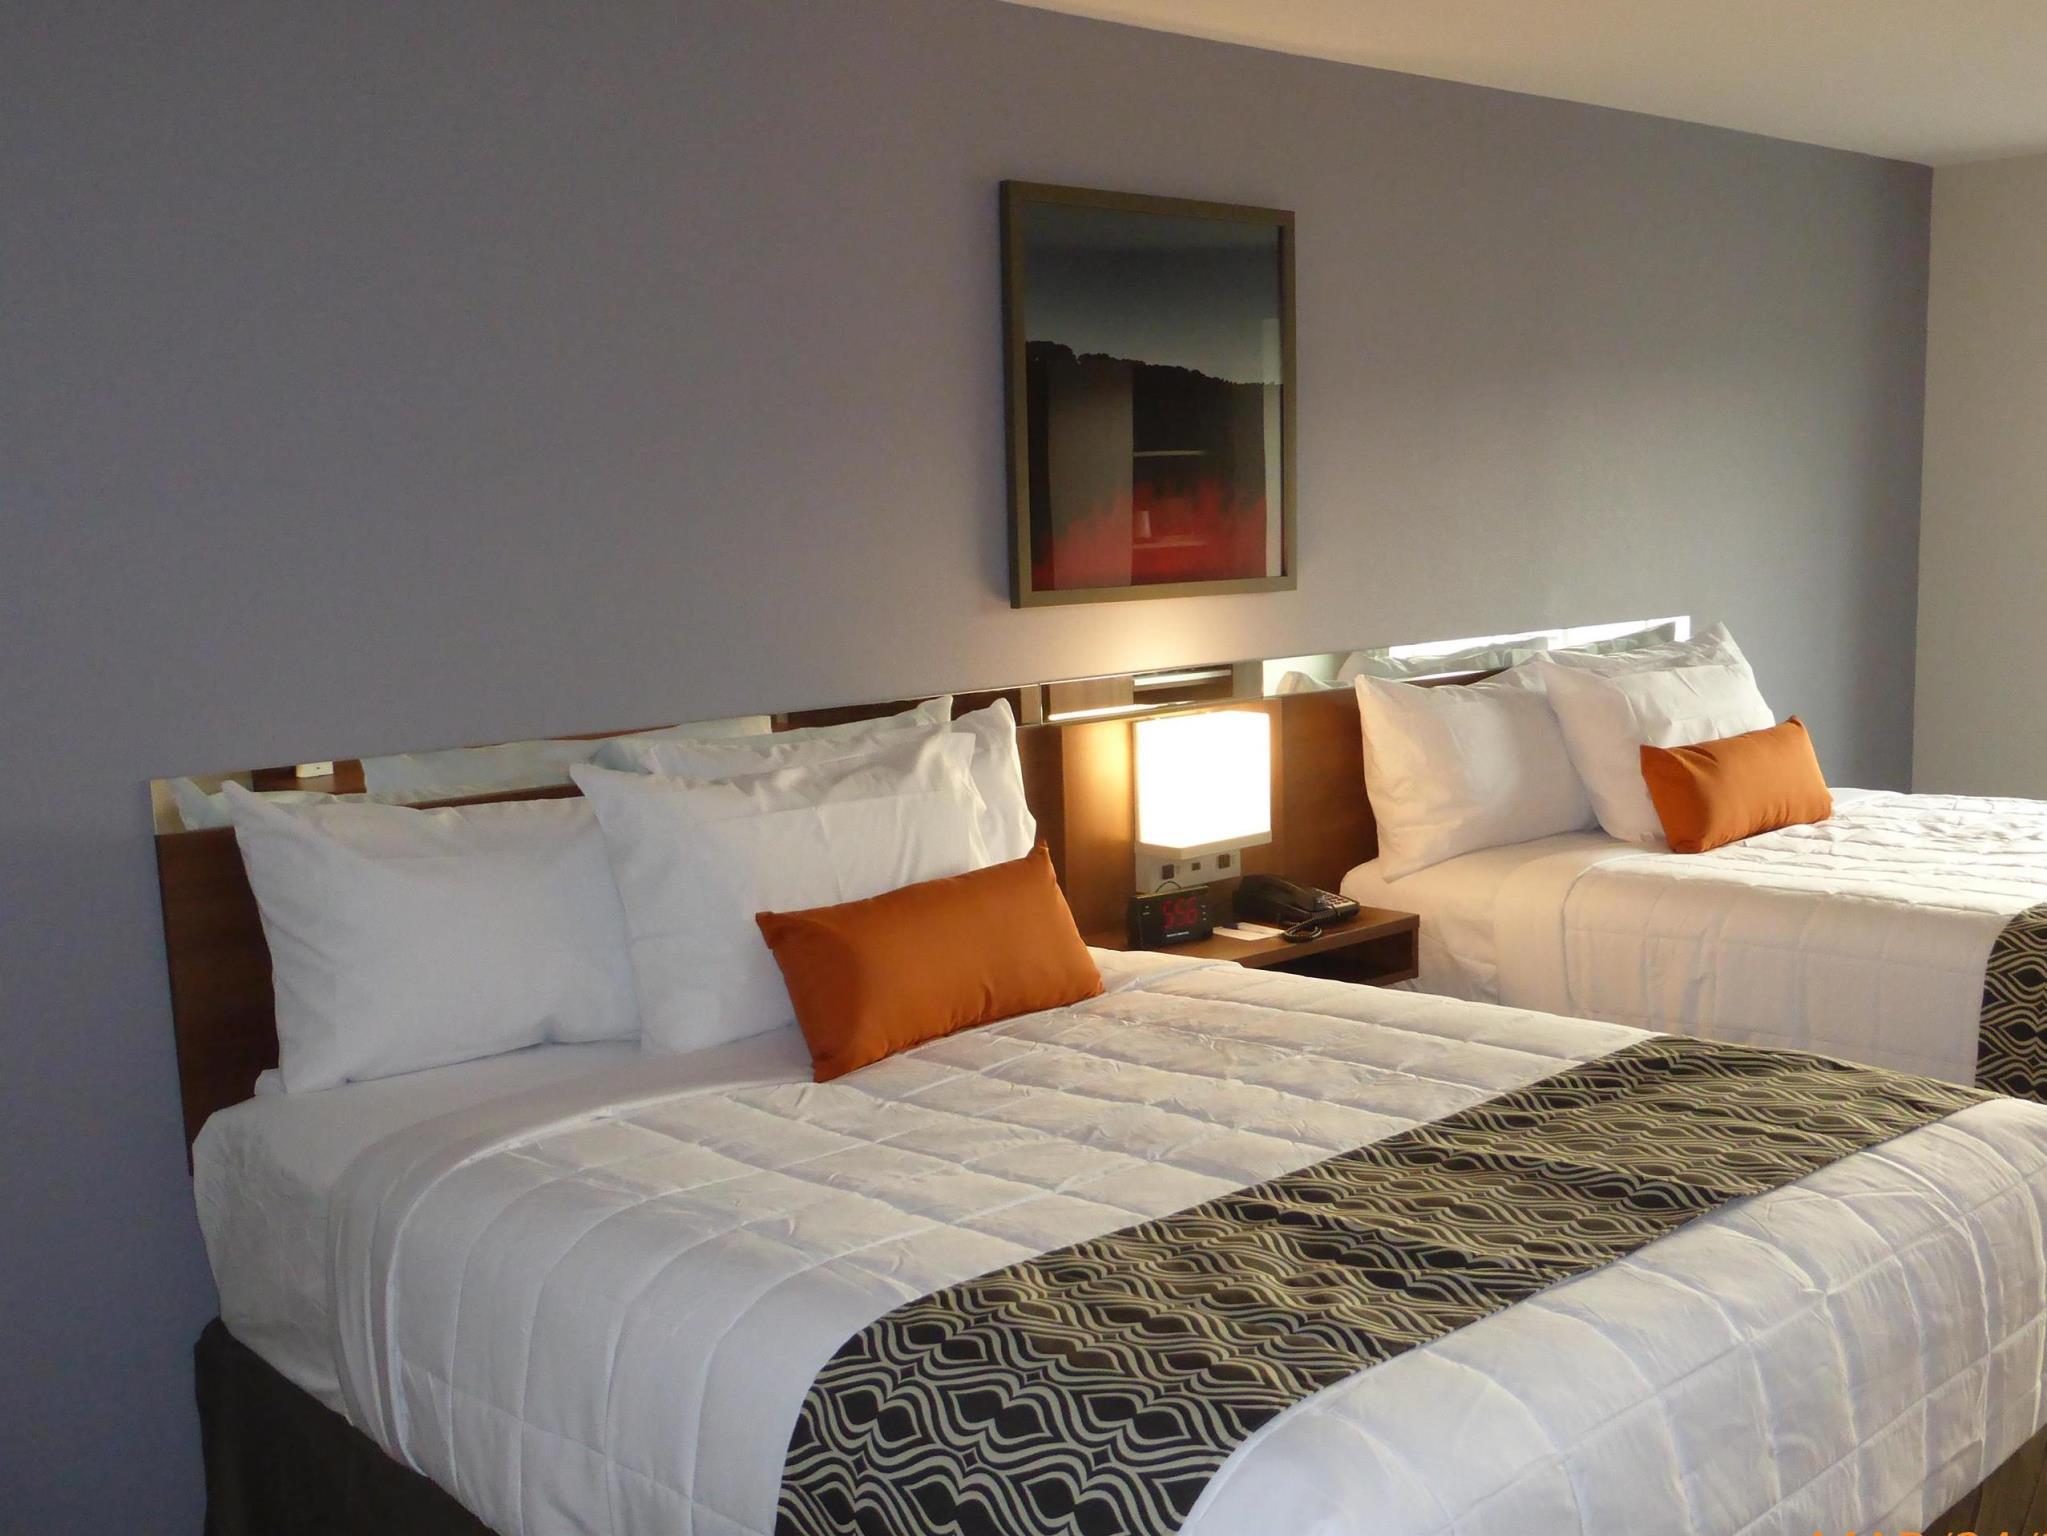 Microtel Inn And Suites By Wyndham Niagara Falls